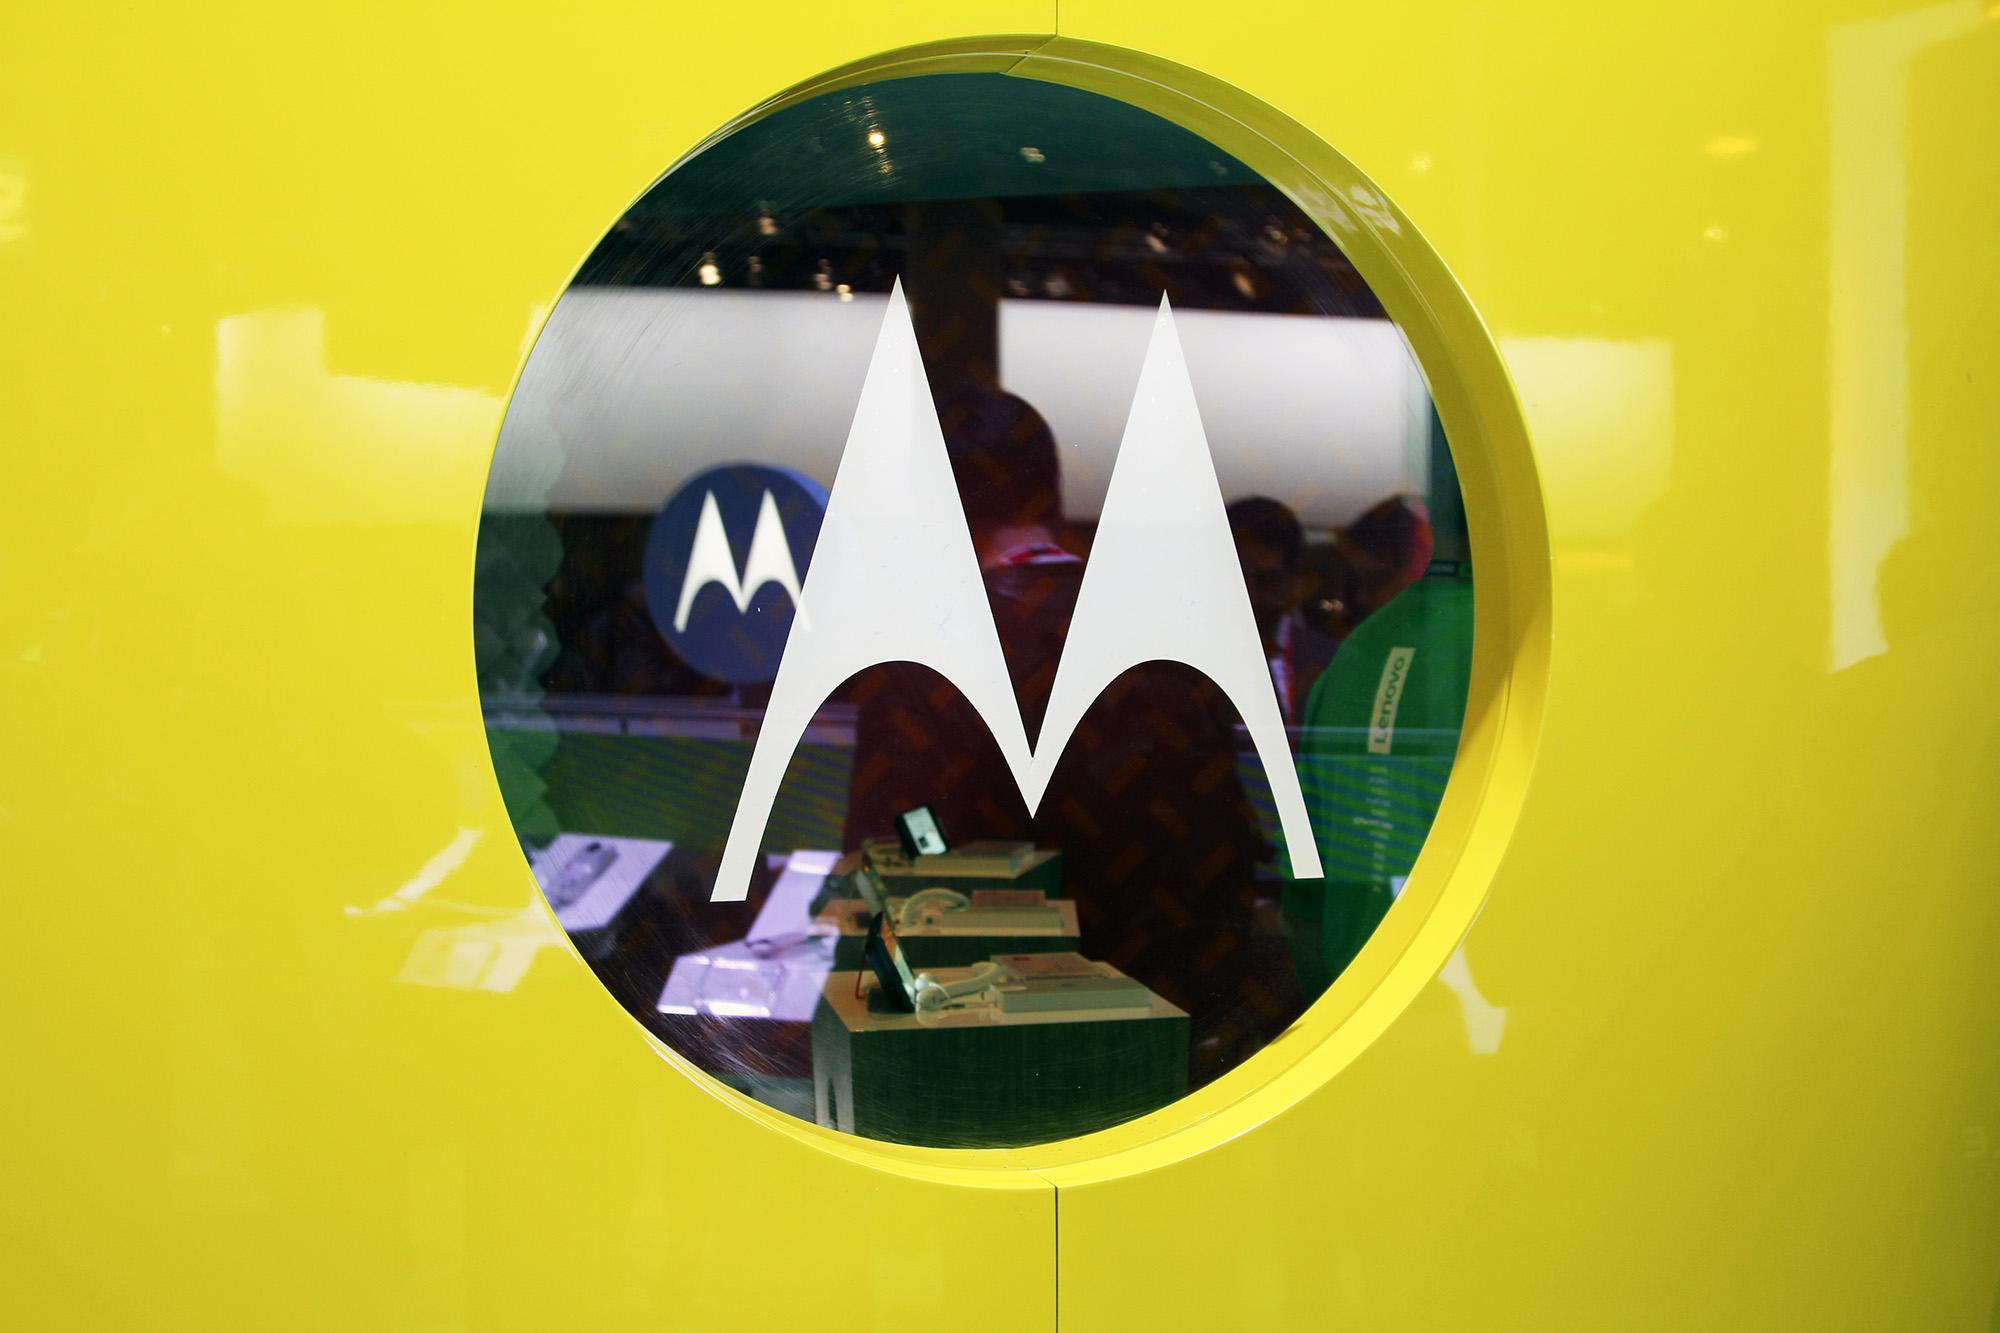 Утечка изображений и спецификаций Moto X 2017 года